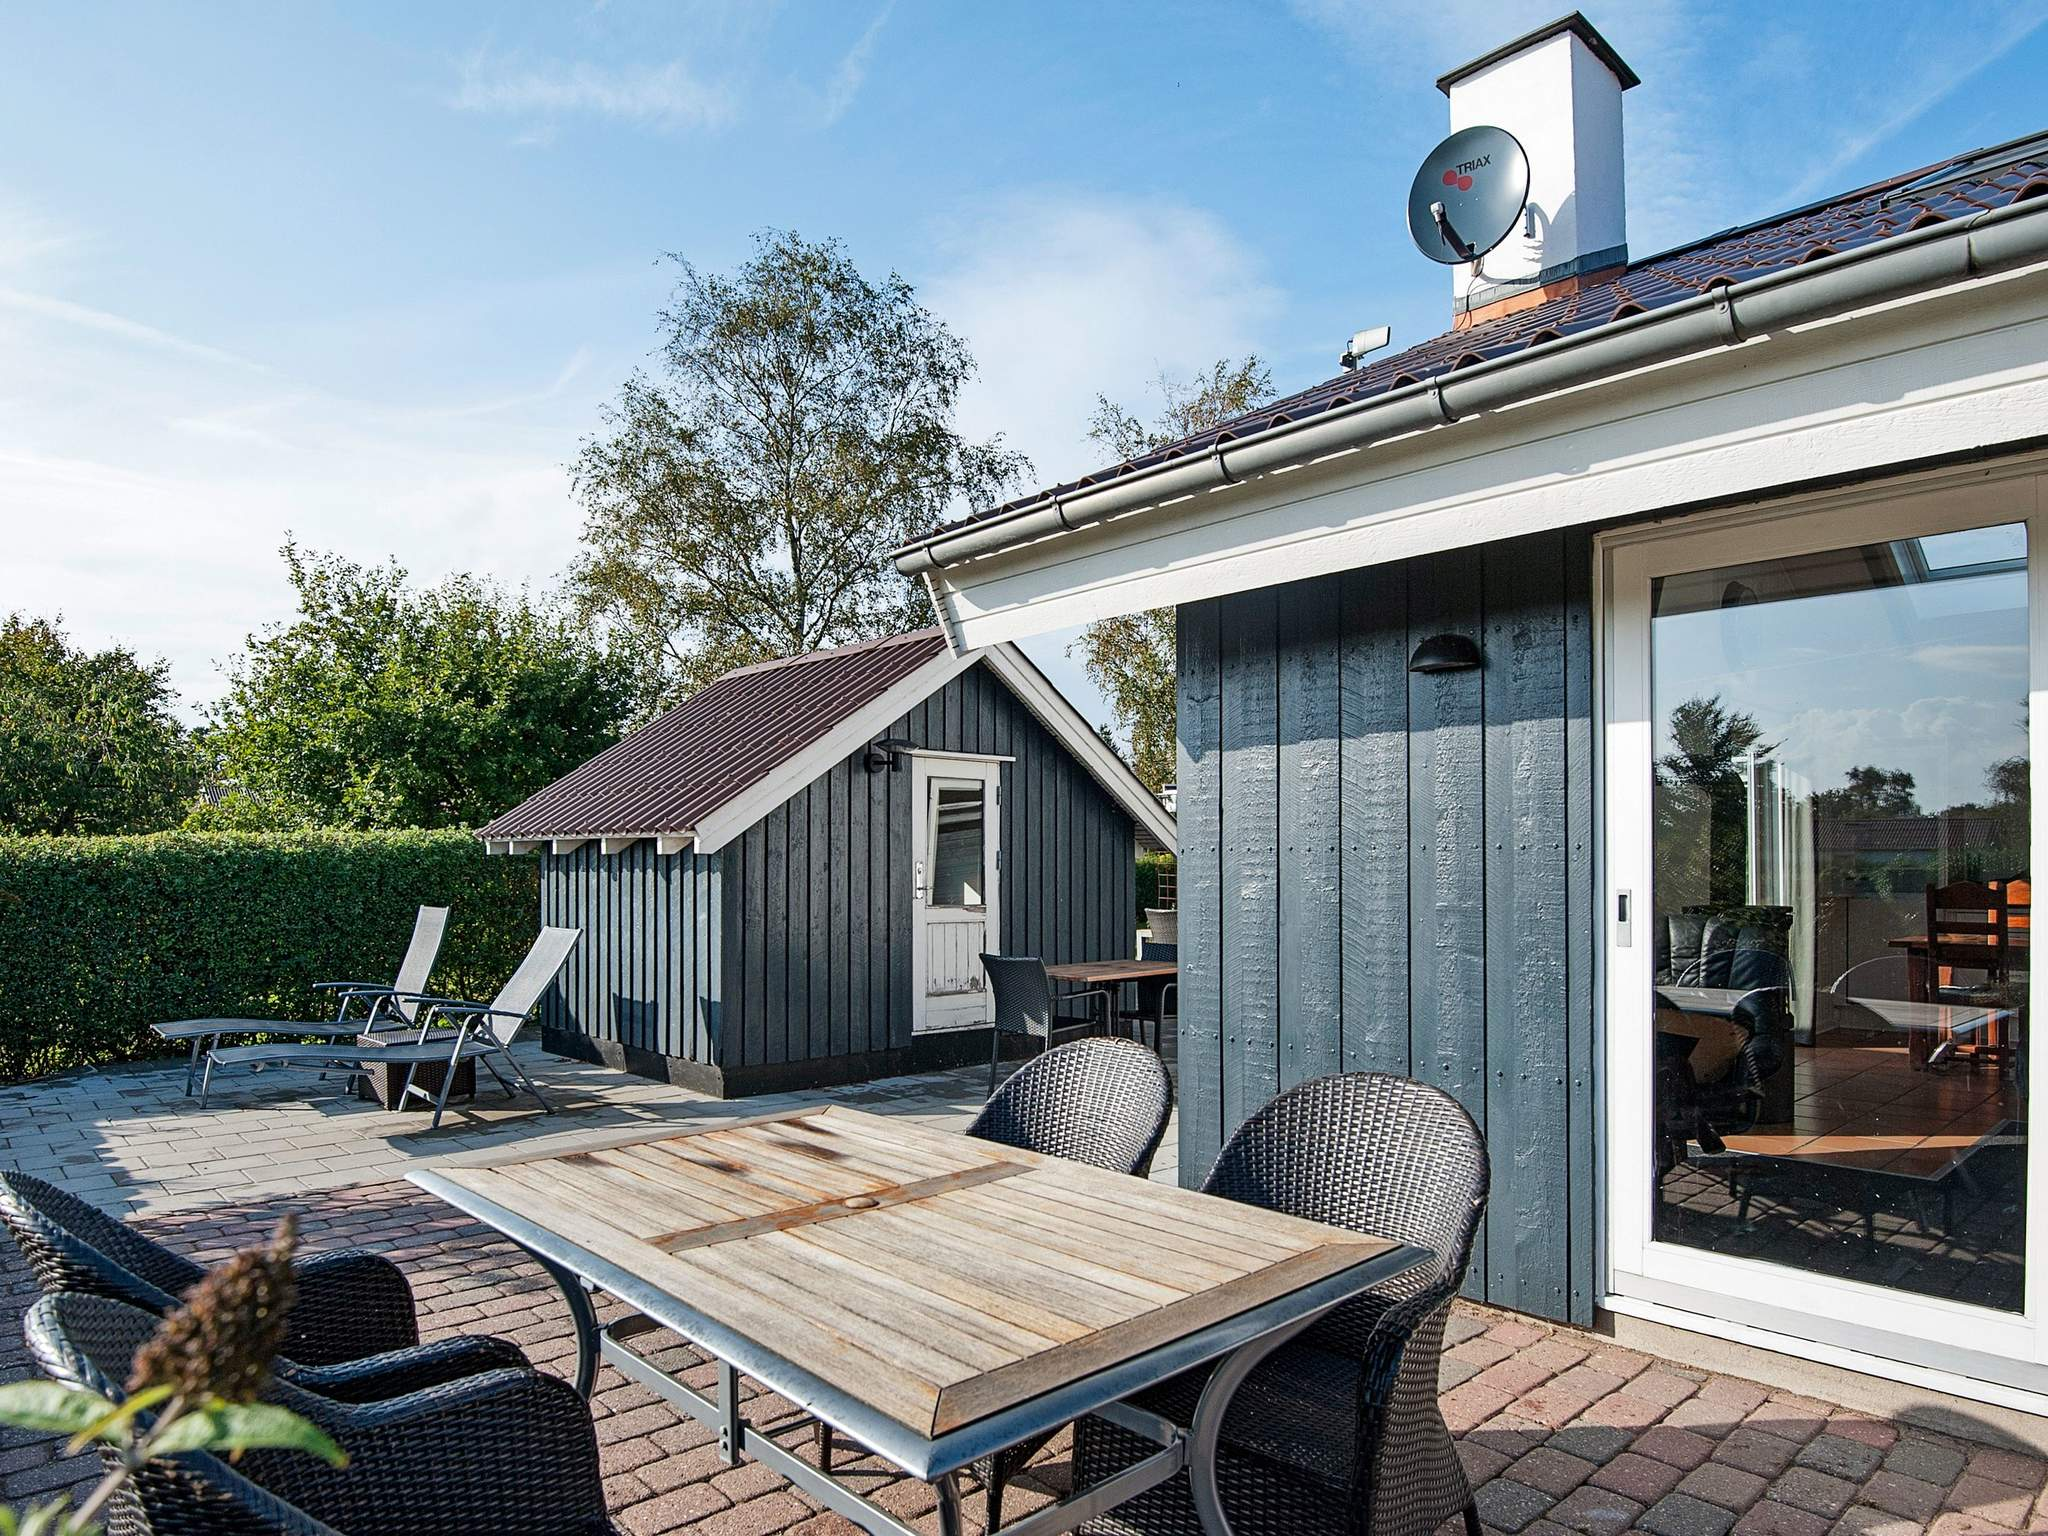 Ferienhaus Hejlsminde Strand (85685), Hejls, , Südostjütland, Dänemark, Bild 27